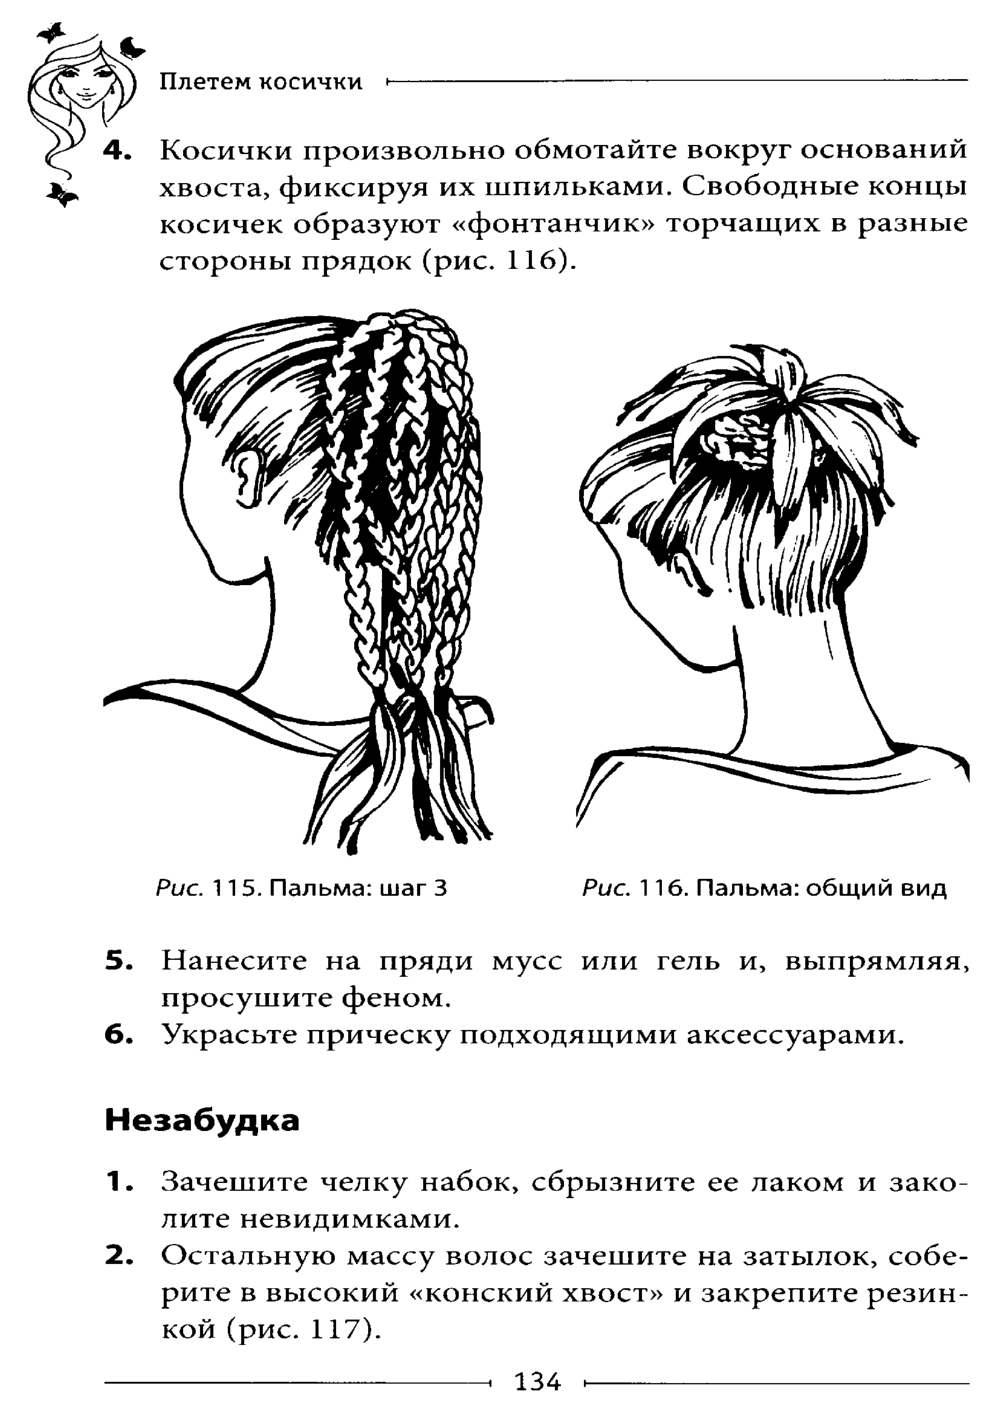 http://i4.imageban.ru/out/2013/11/15/fa7bd1389a8ecf950c999e992a79cdb5.jpg